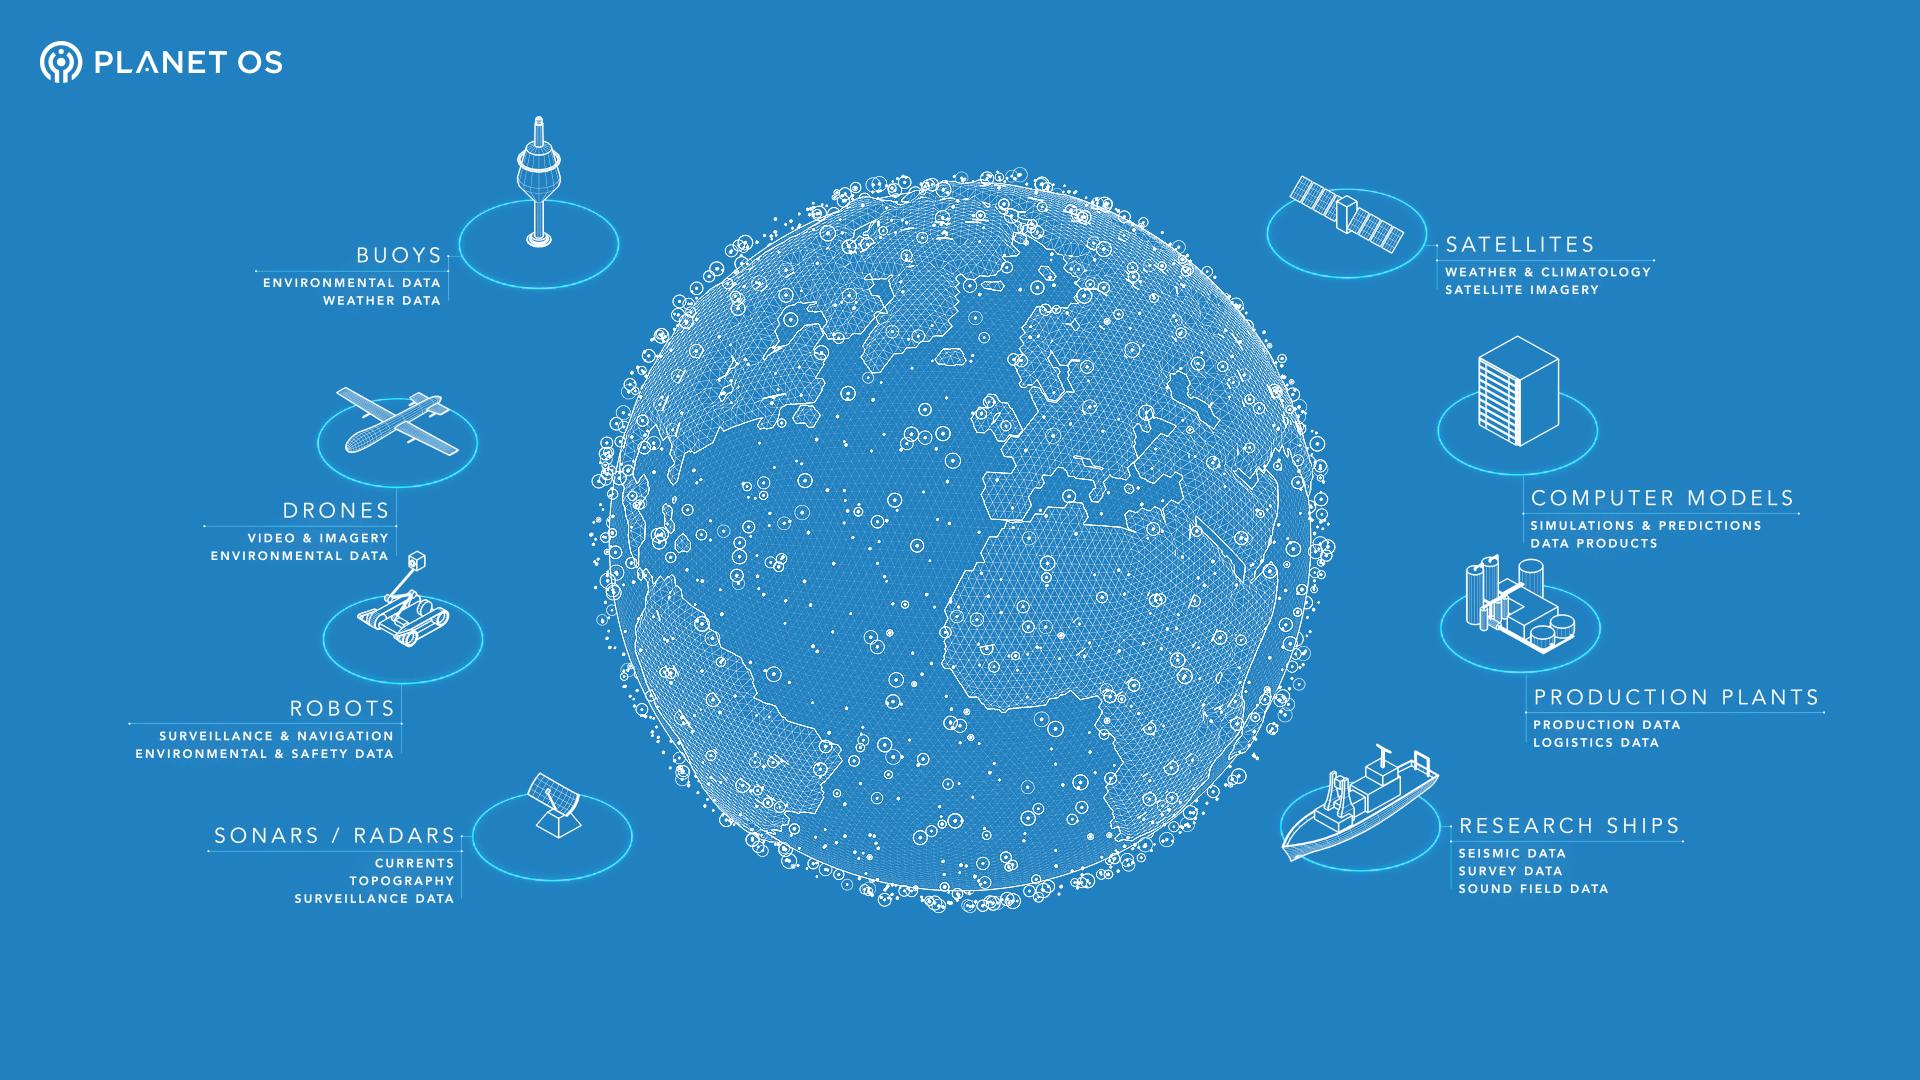 Intertrust Technologies acquires Planet OS